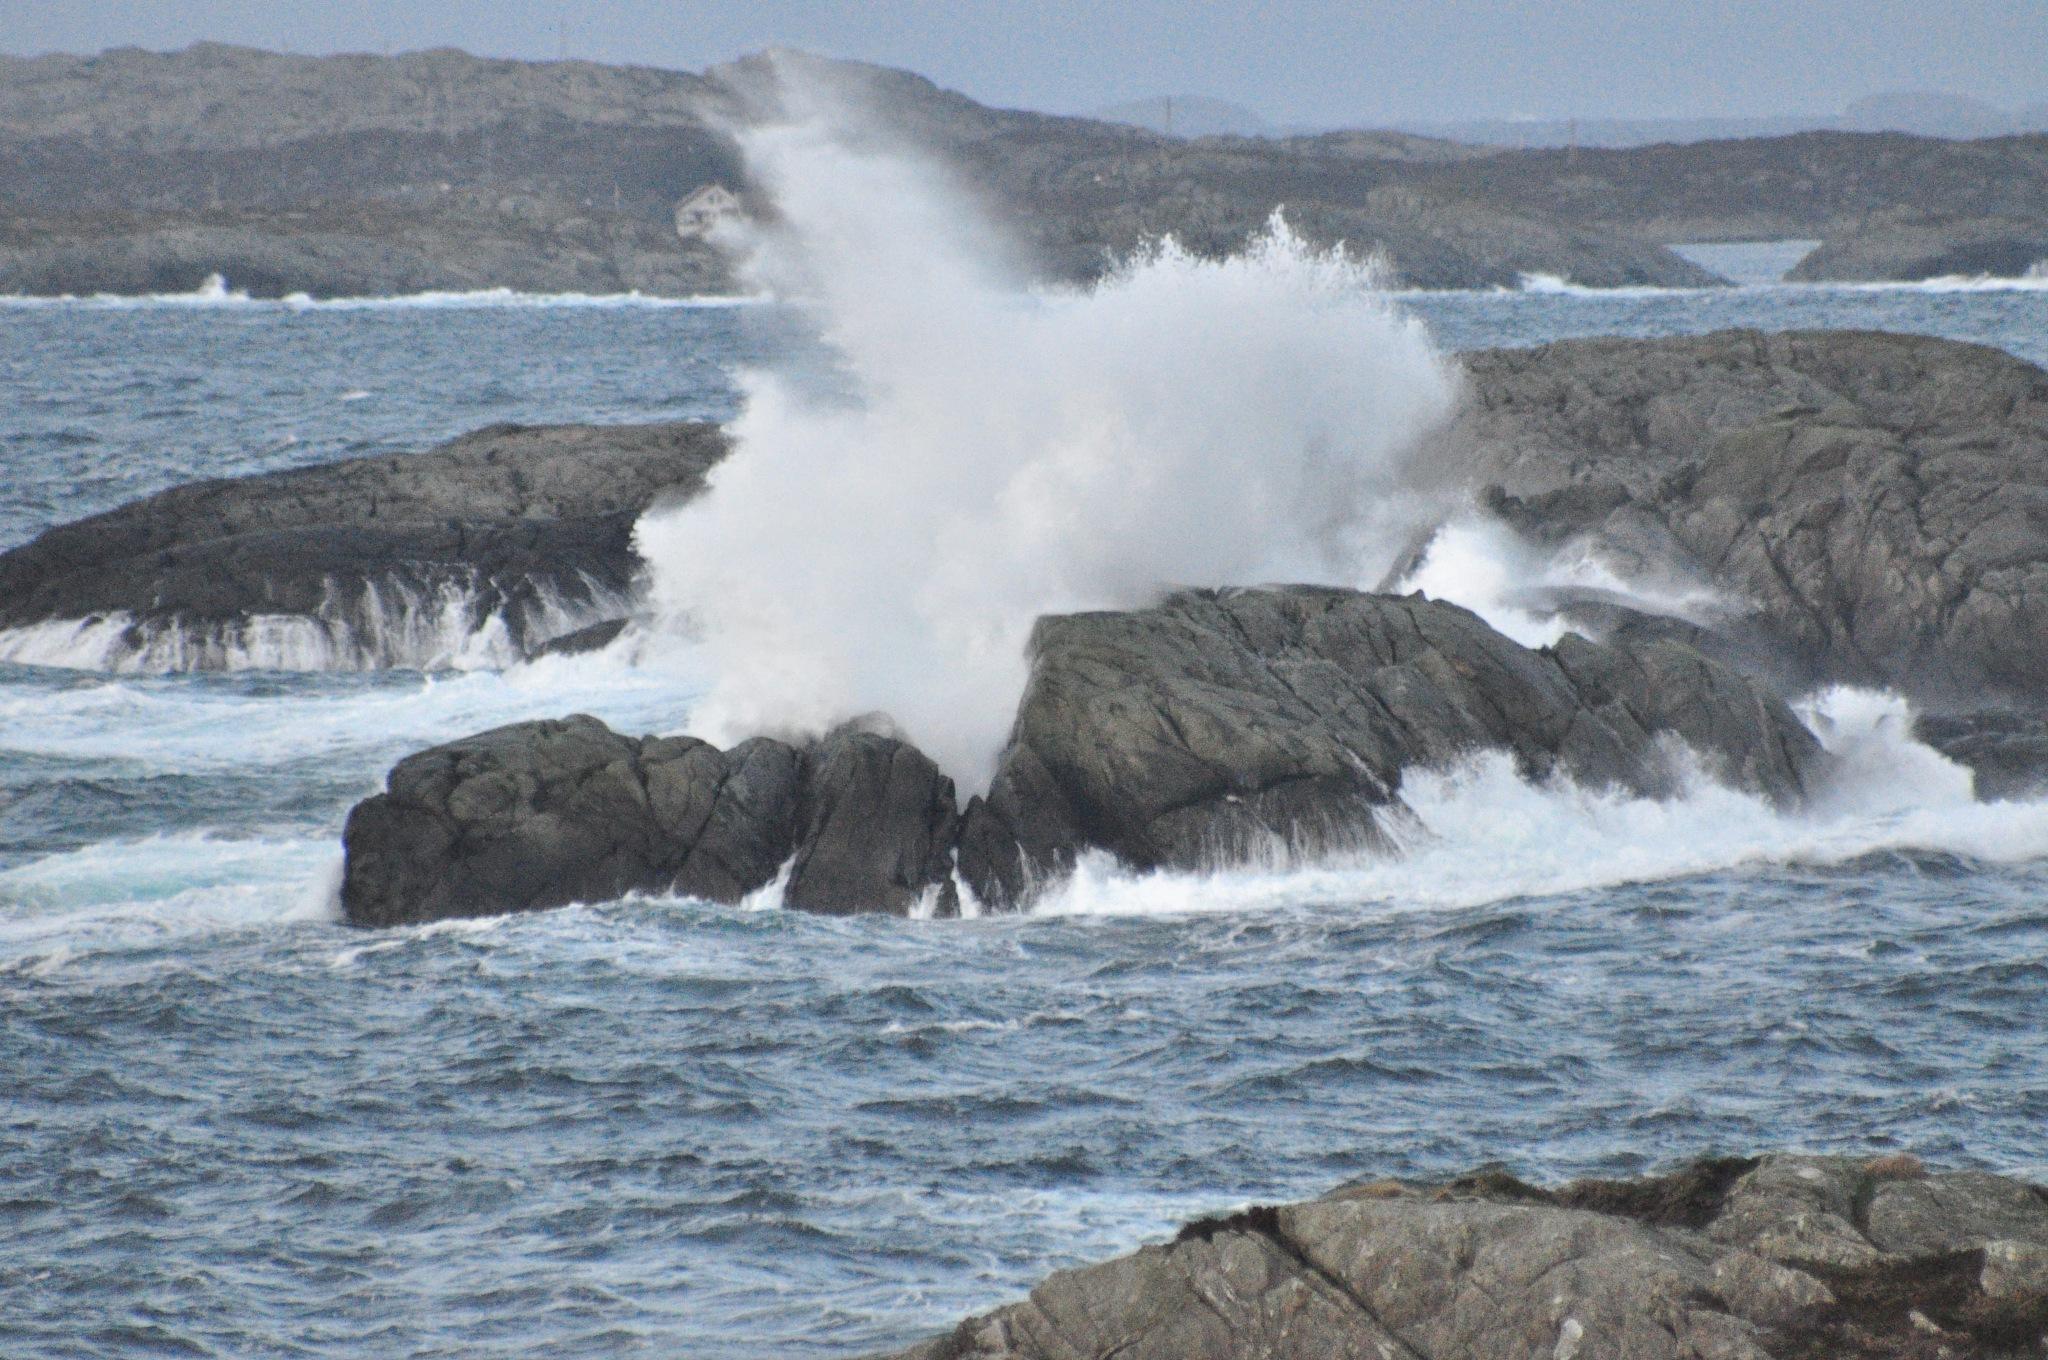 Stormwave by Dag Olav Øverland